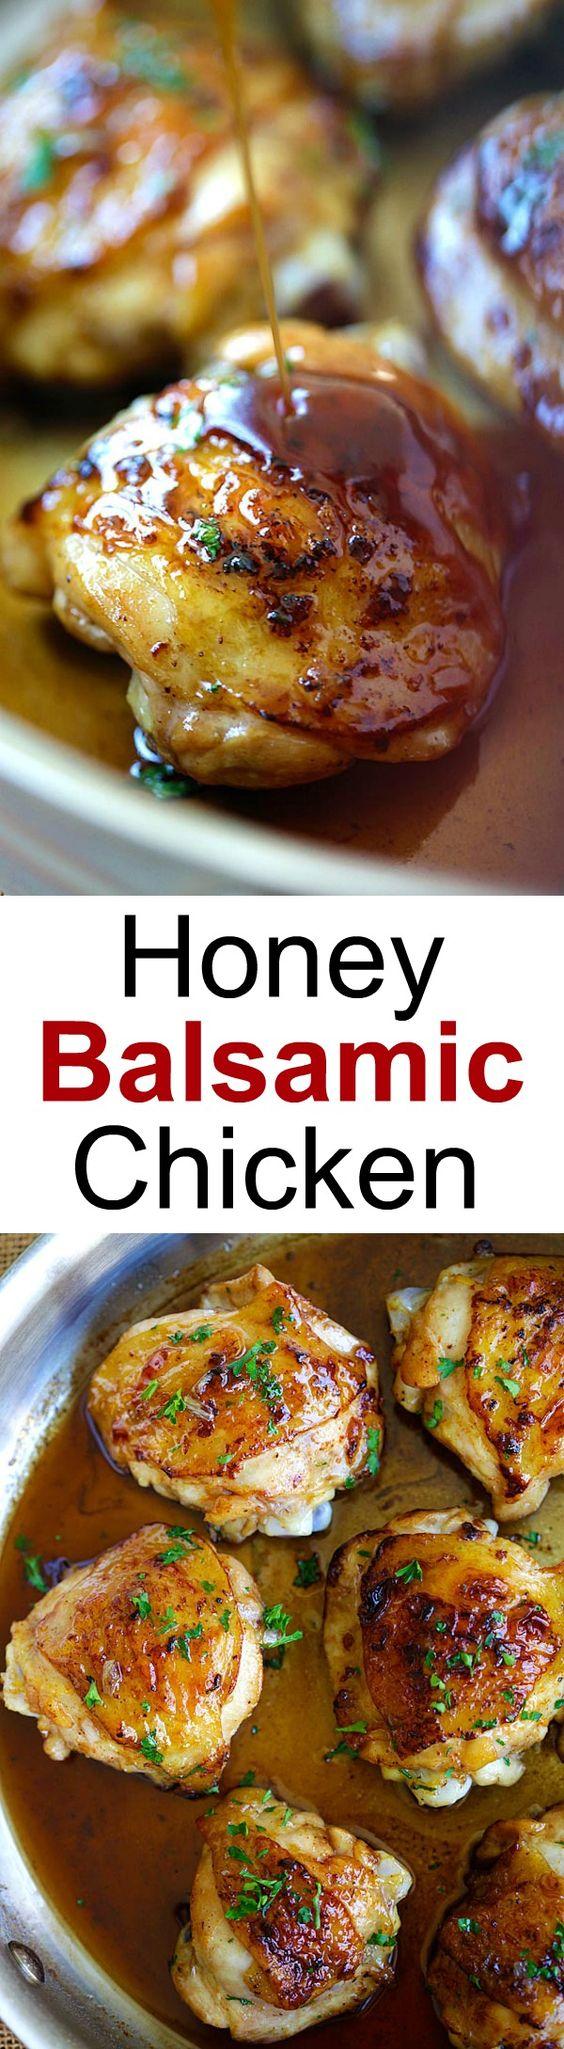 ... Recipe | Honey Balsamic Chicken, Balsamic Chicken and Skillet Chicken